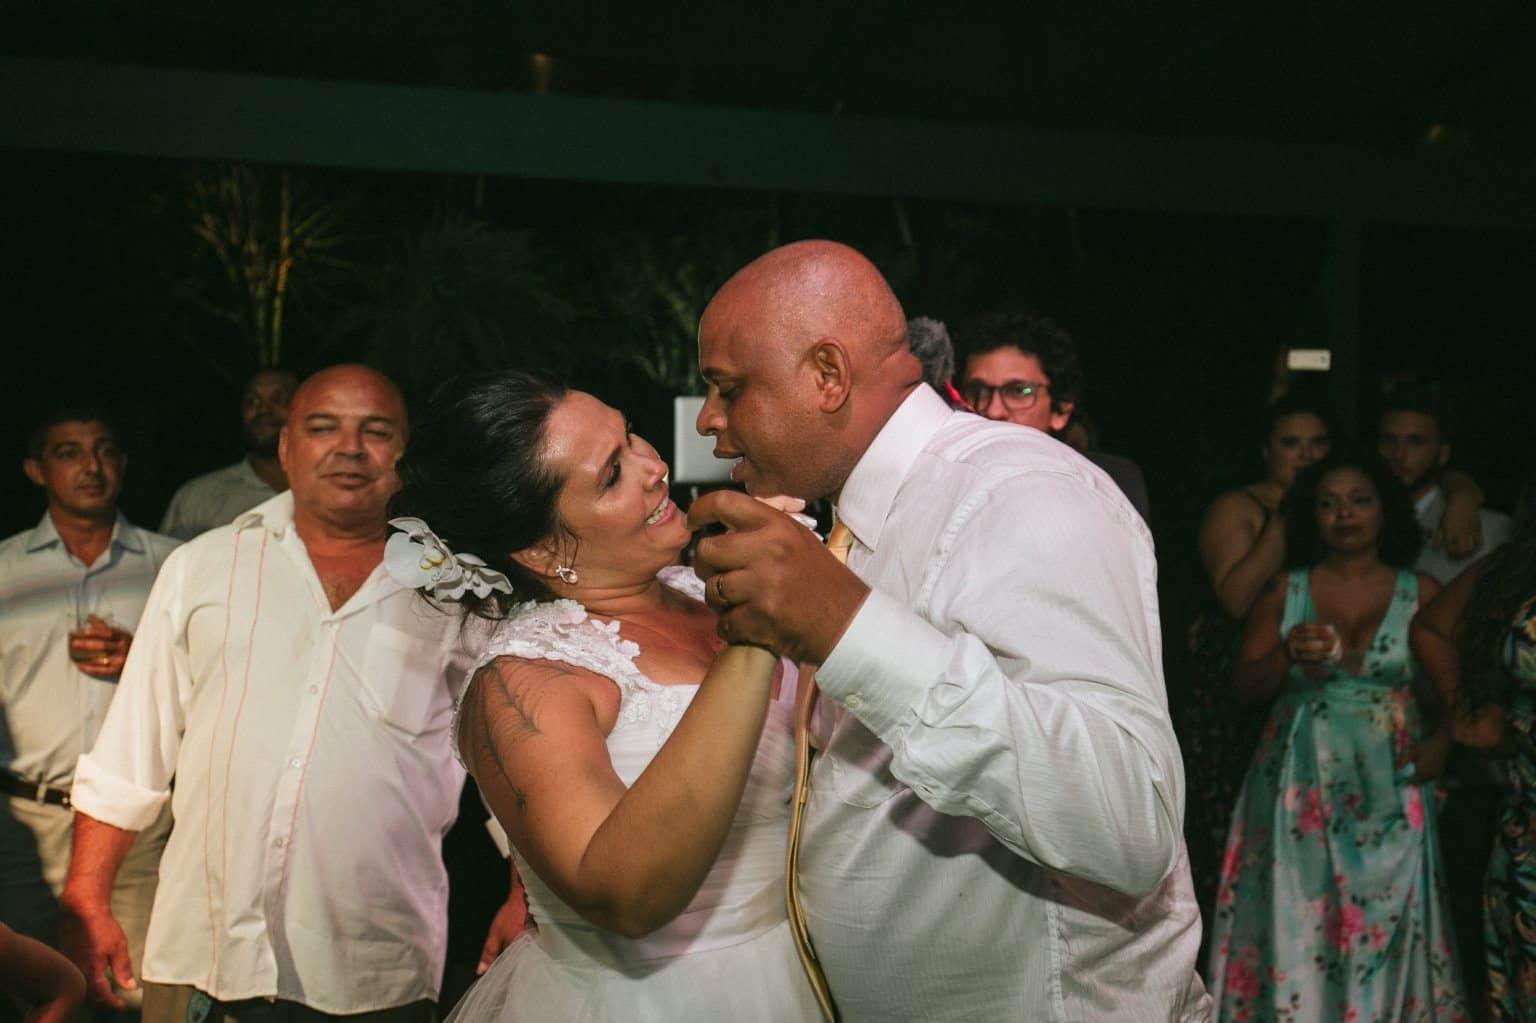 casamento-karina-e-marcos-felizes-para-sempre-caseme-14